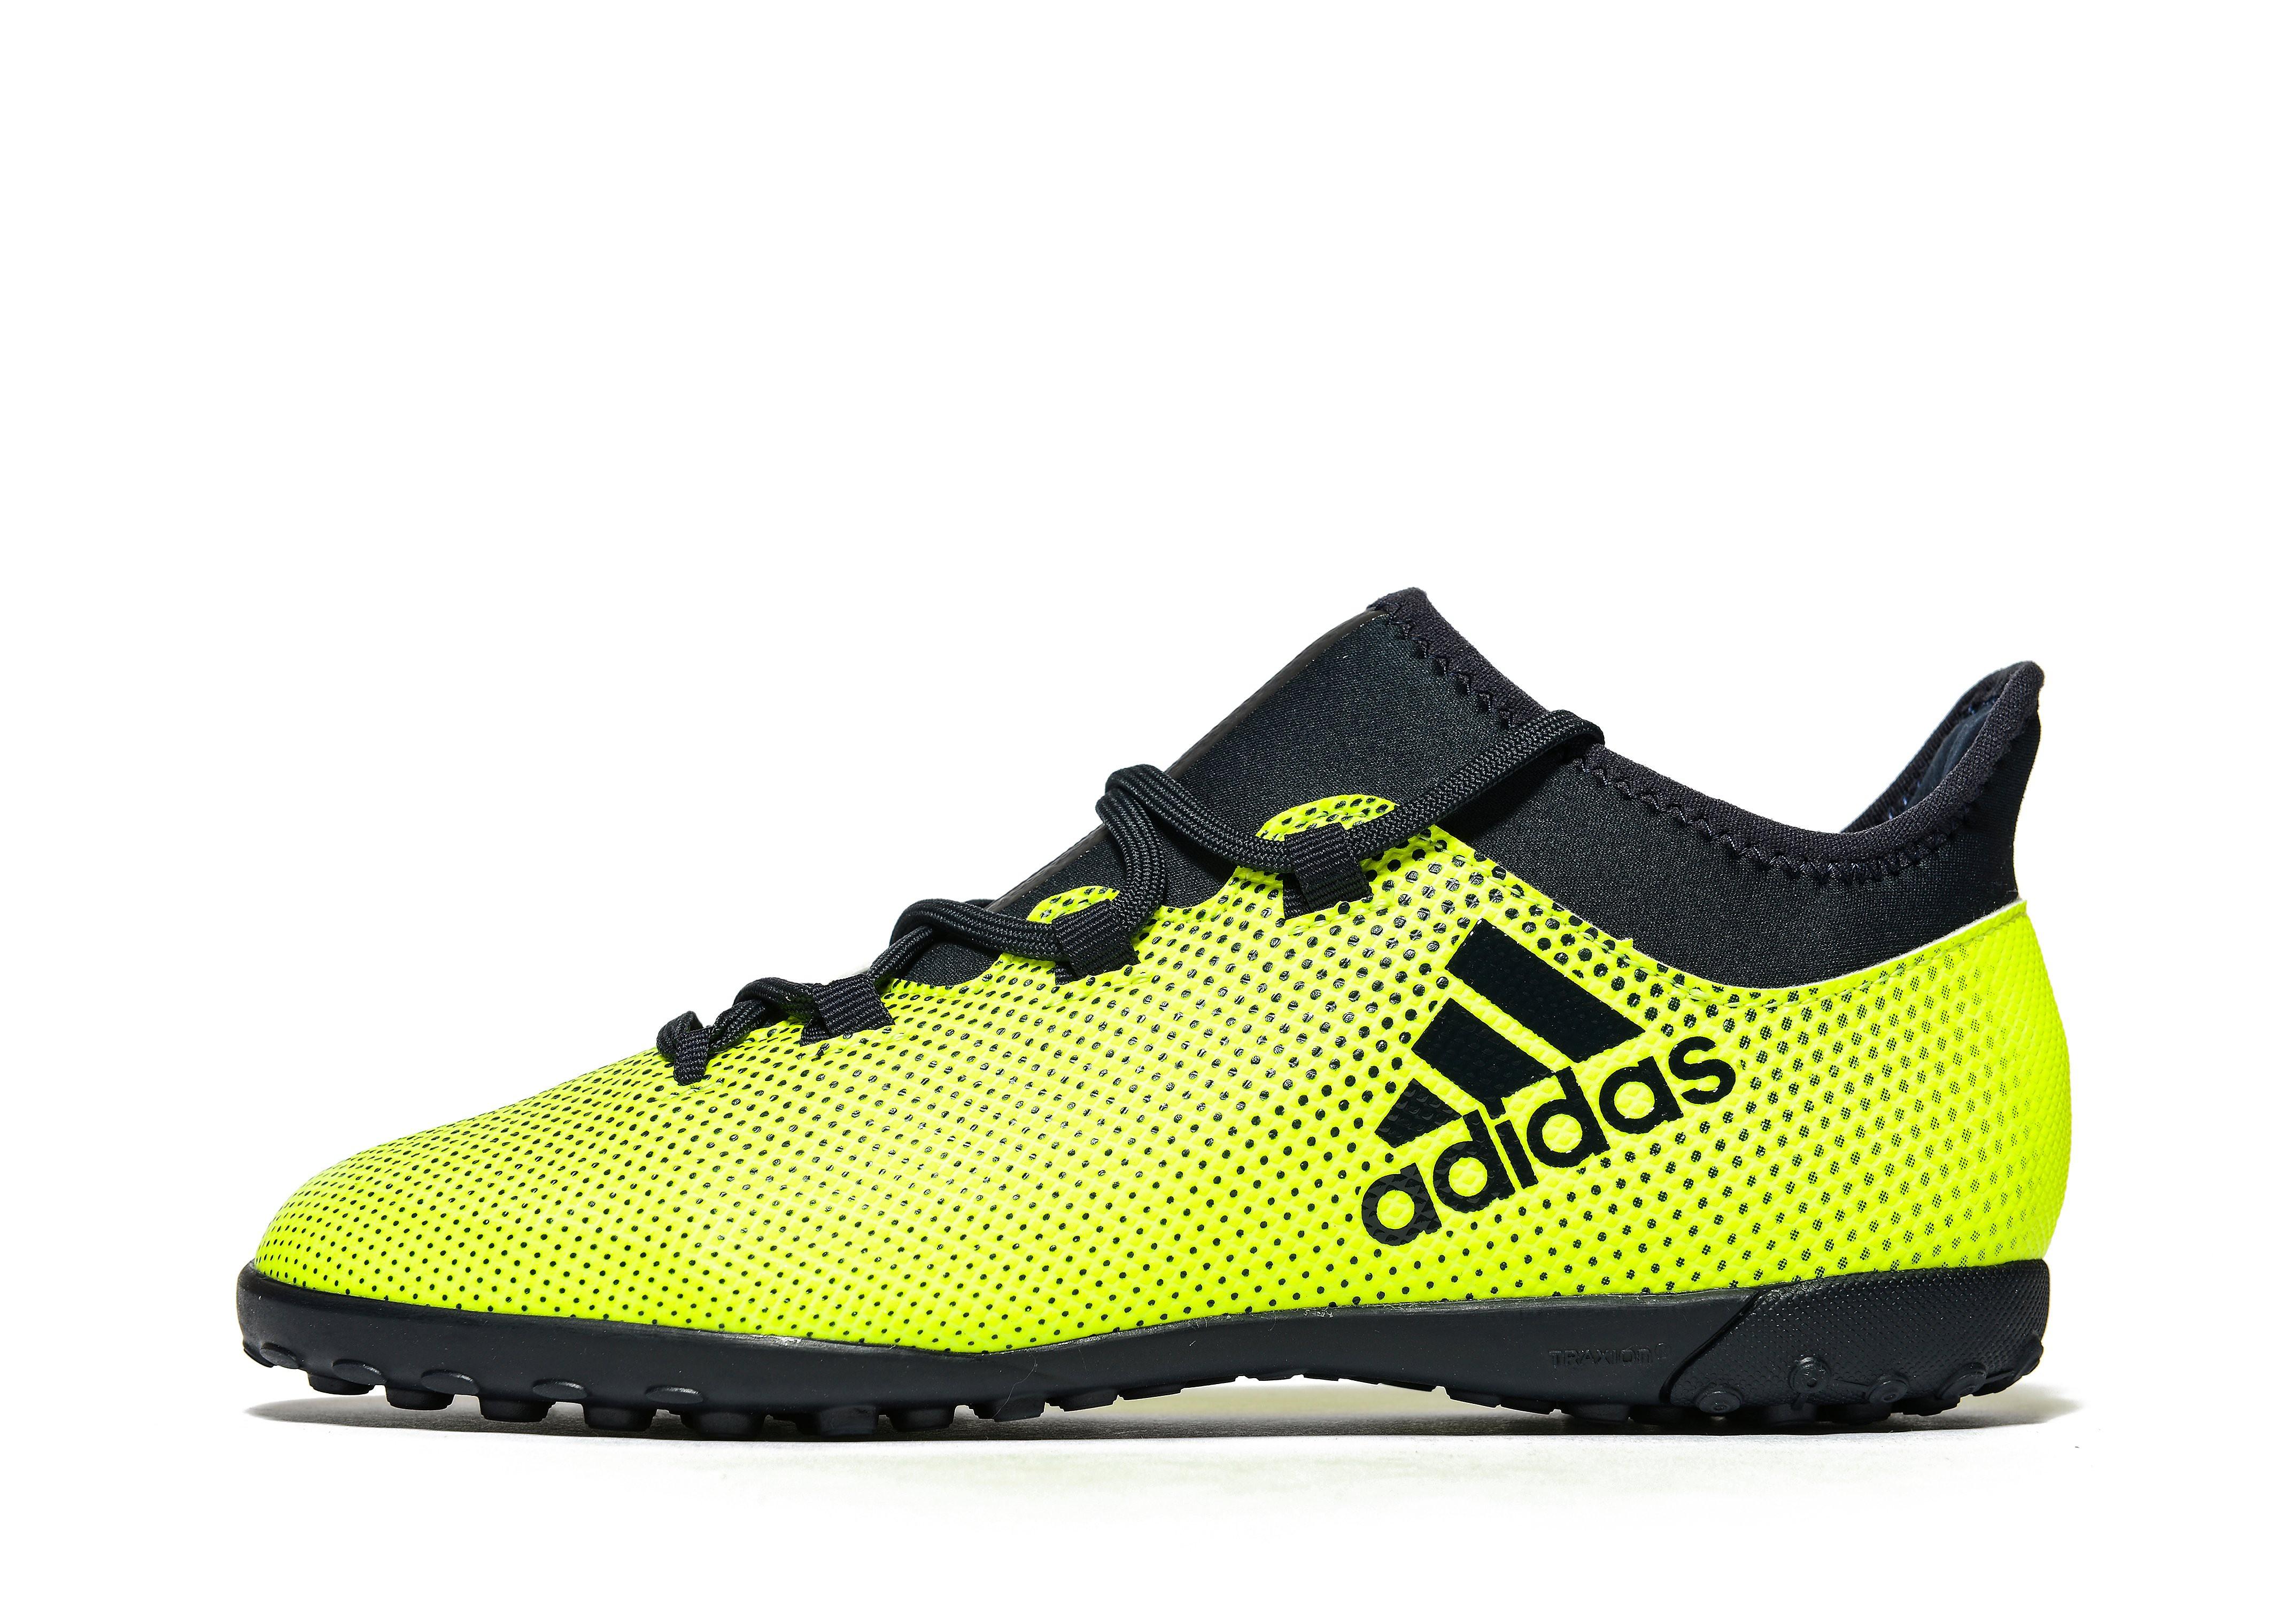 adidas Ocean Storm X 17.3 TF Children